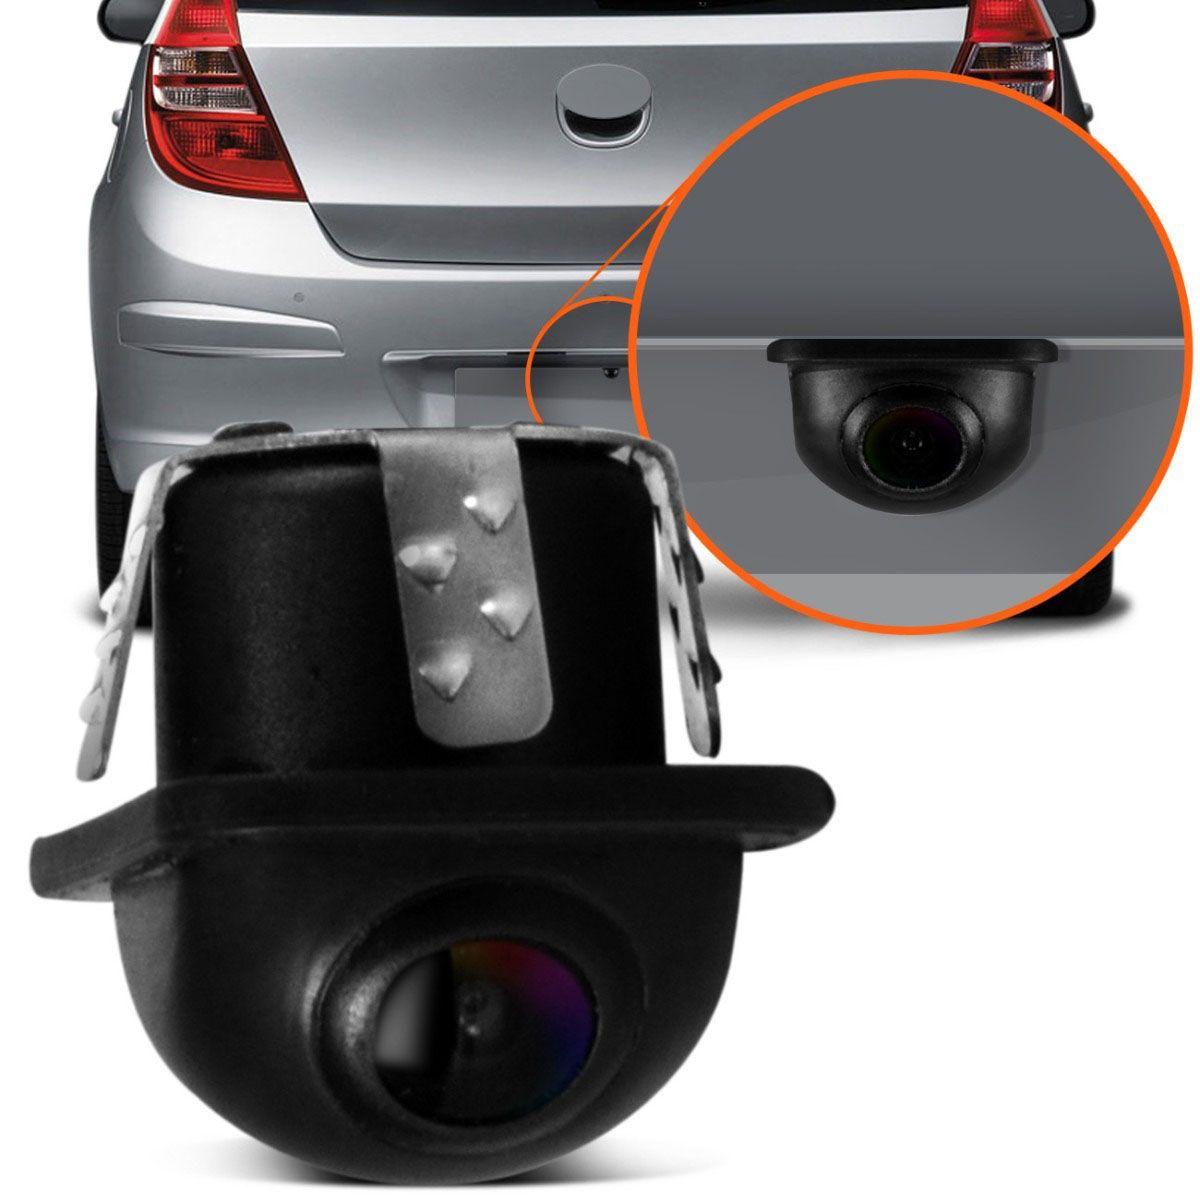 Câmera de Ré Tartaruga Automotiva Estacionamento Universal Colorida Tay Tech Preta